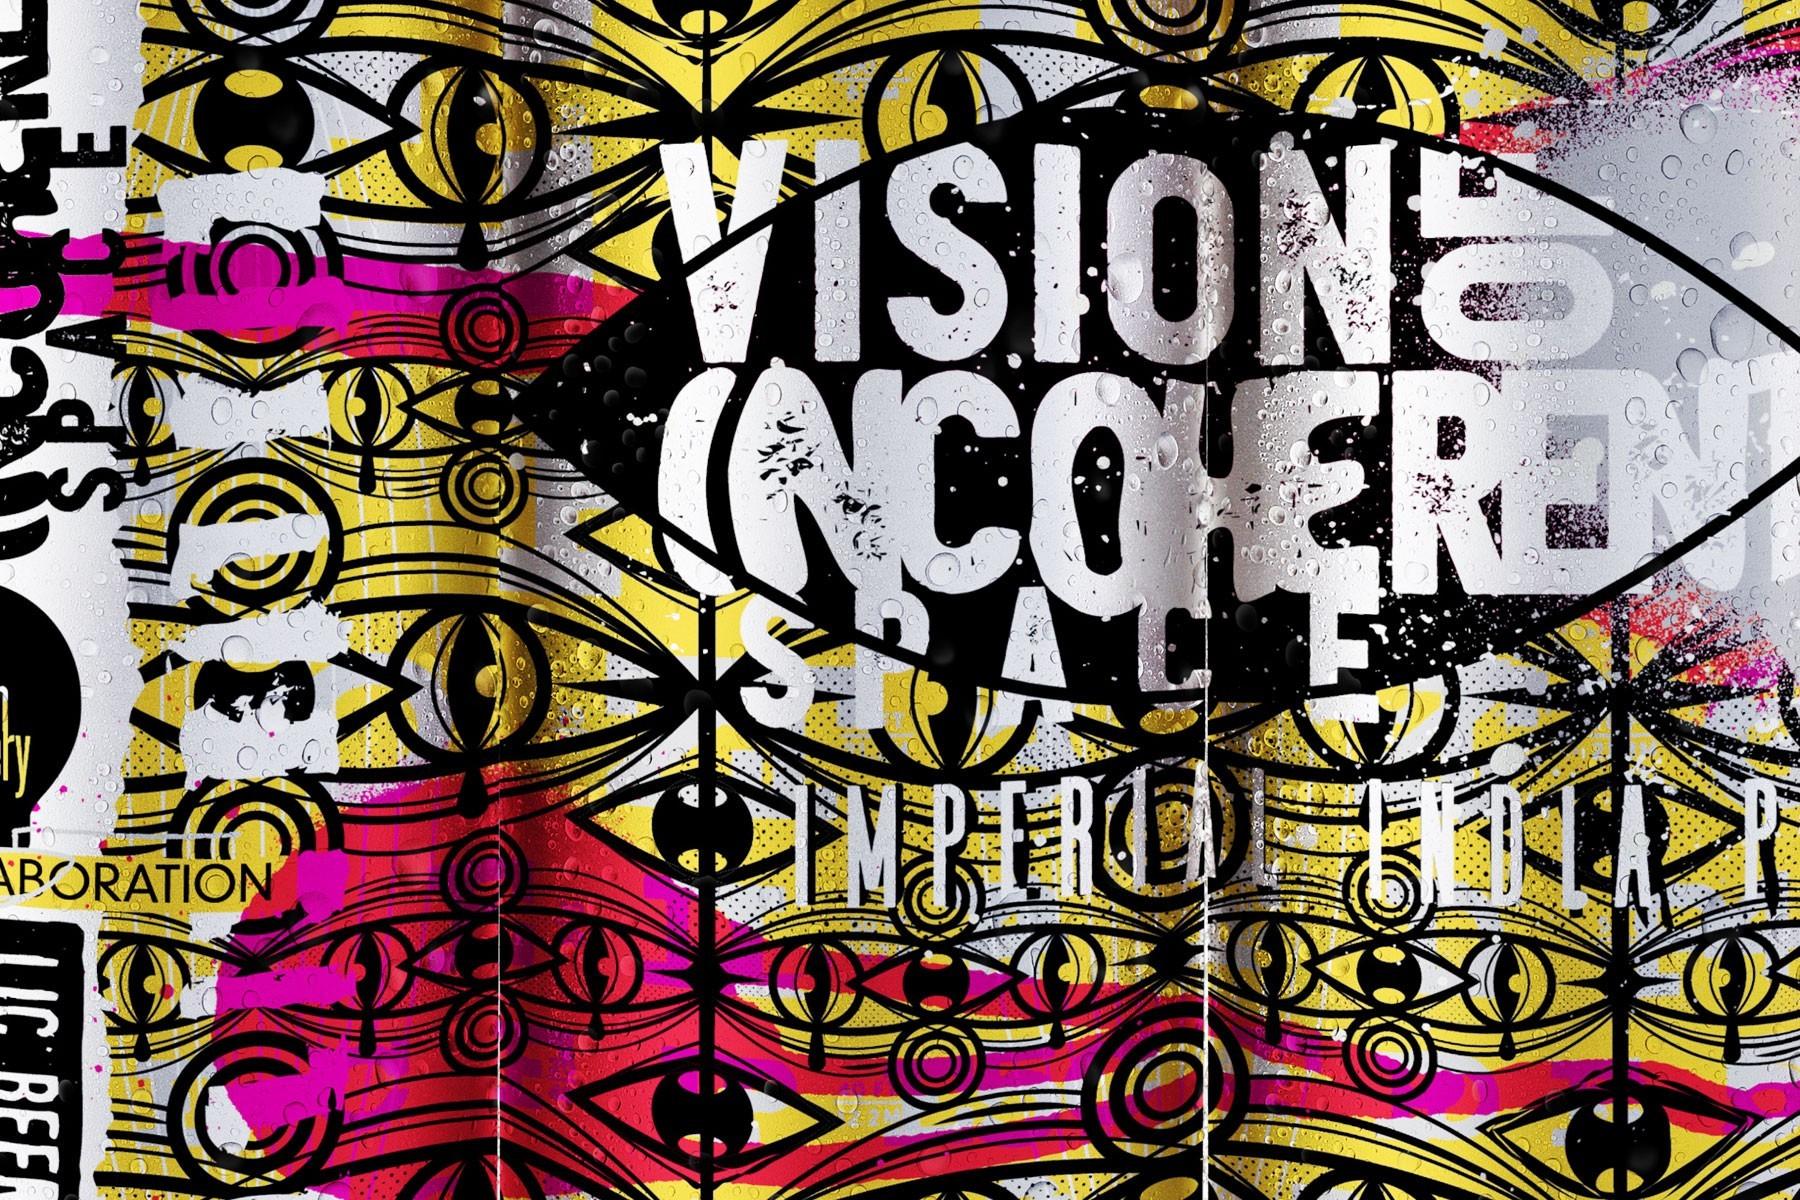 Vision_03_Web